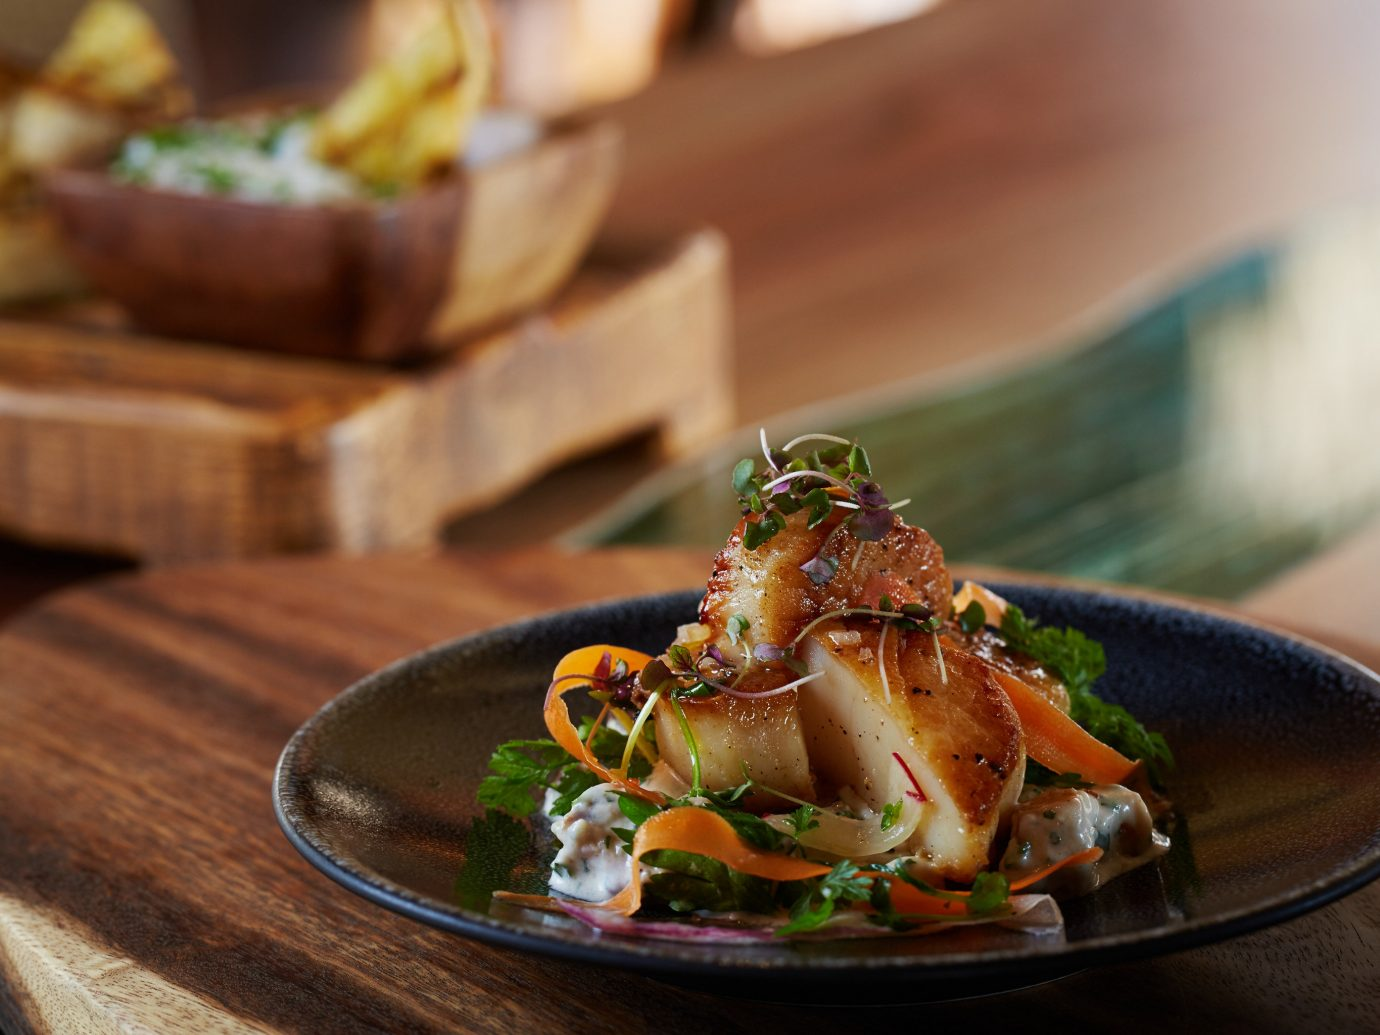 Trip Ideas table food plate indoor dish meal cuisine Seafood recipe brunch appetizer